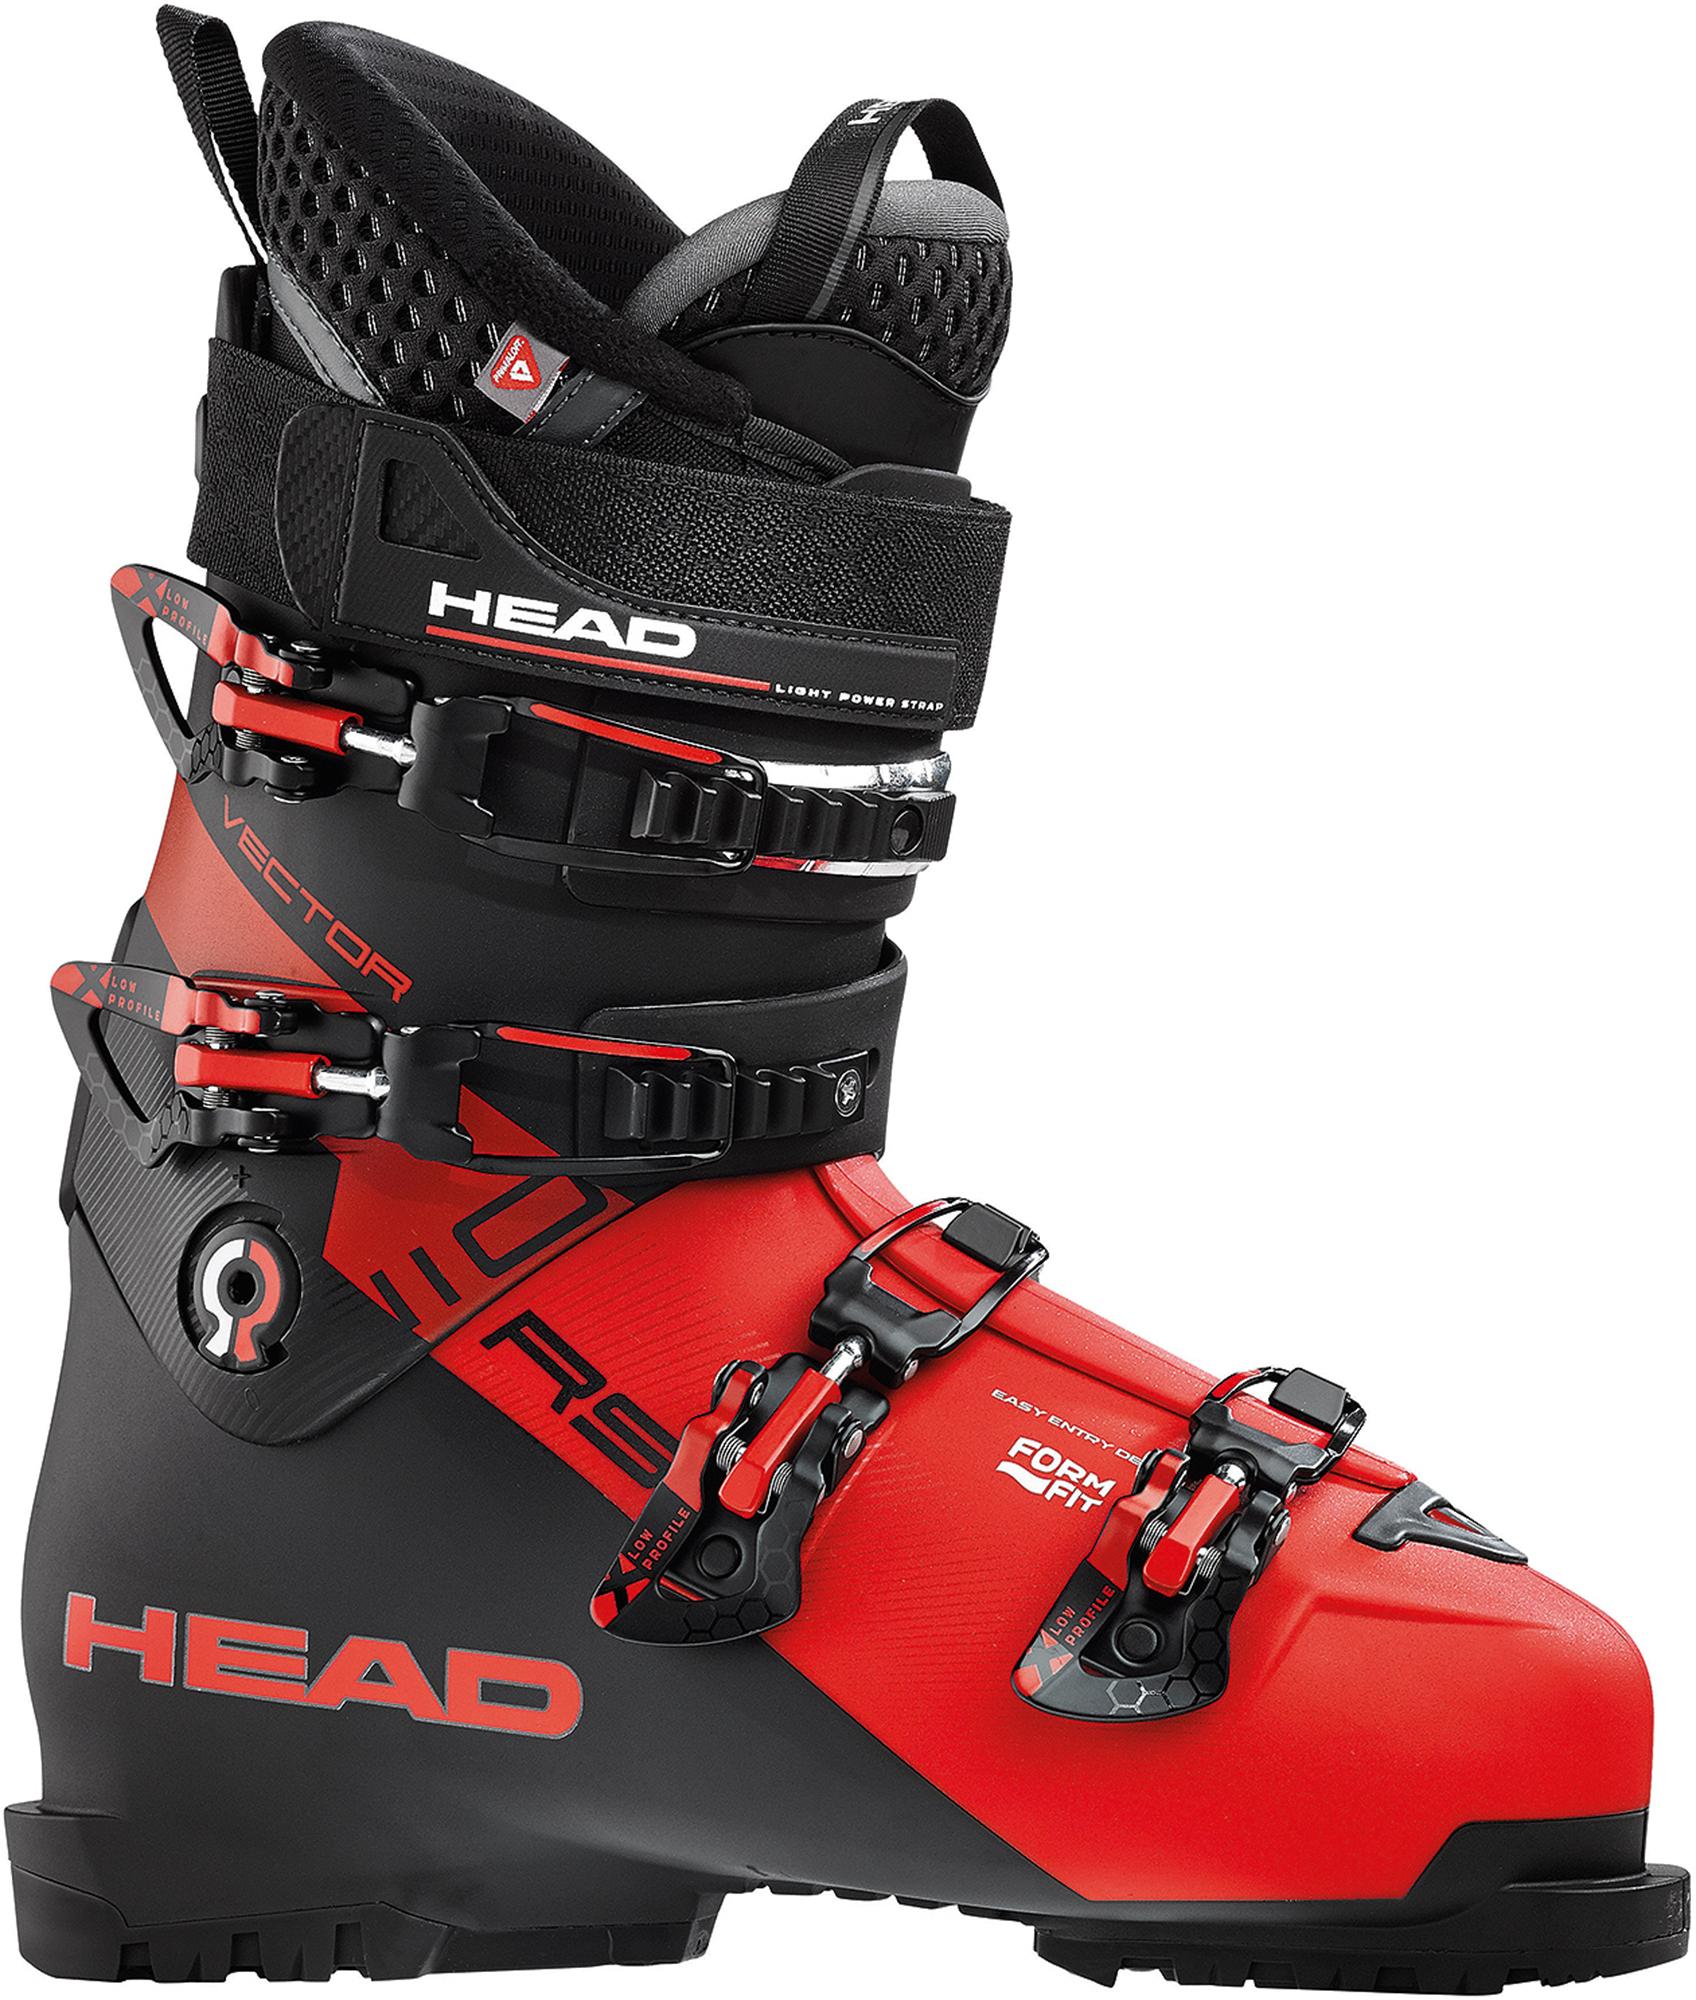 Head Ботинки горнолыжные Vector RS 110, размер 44